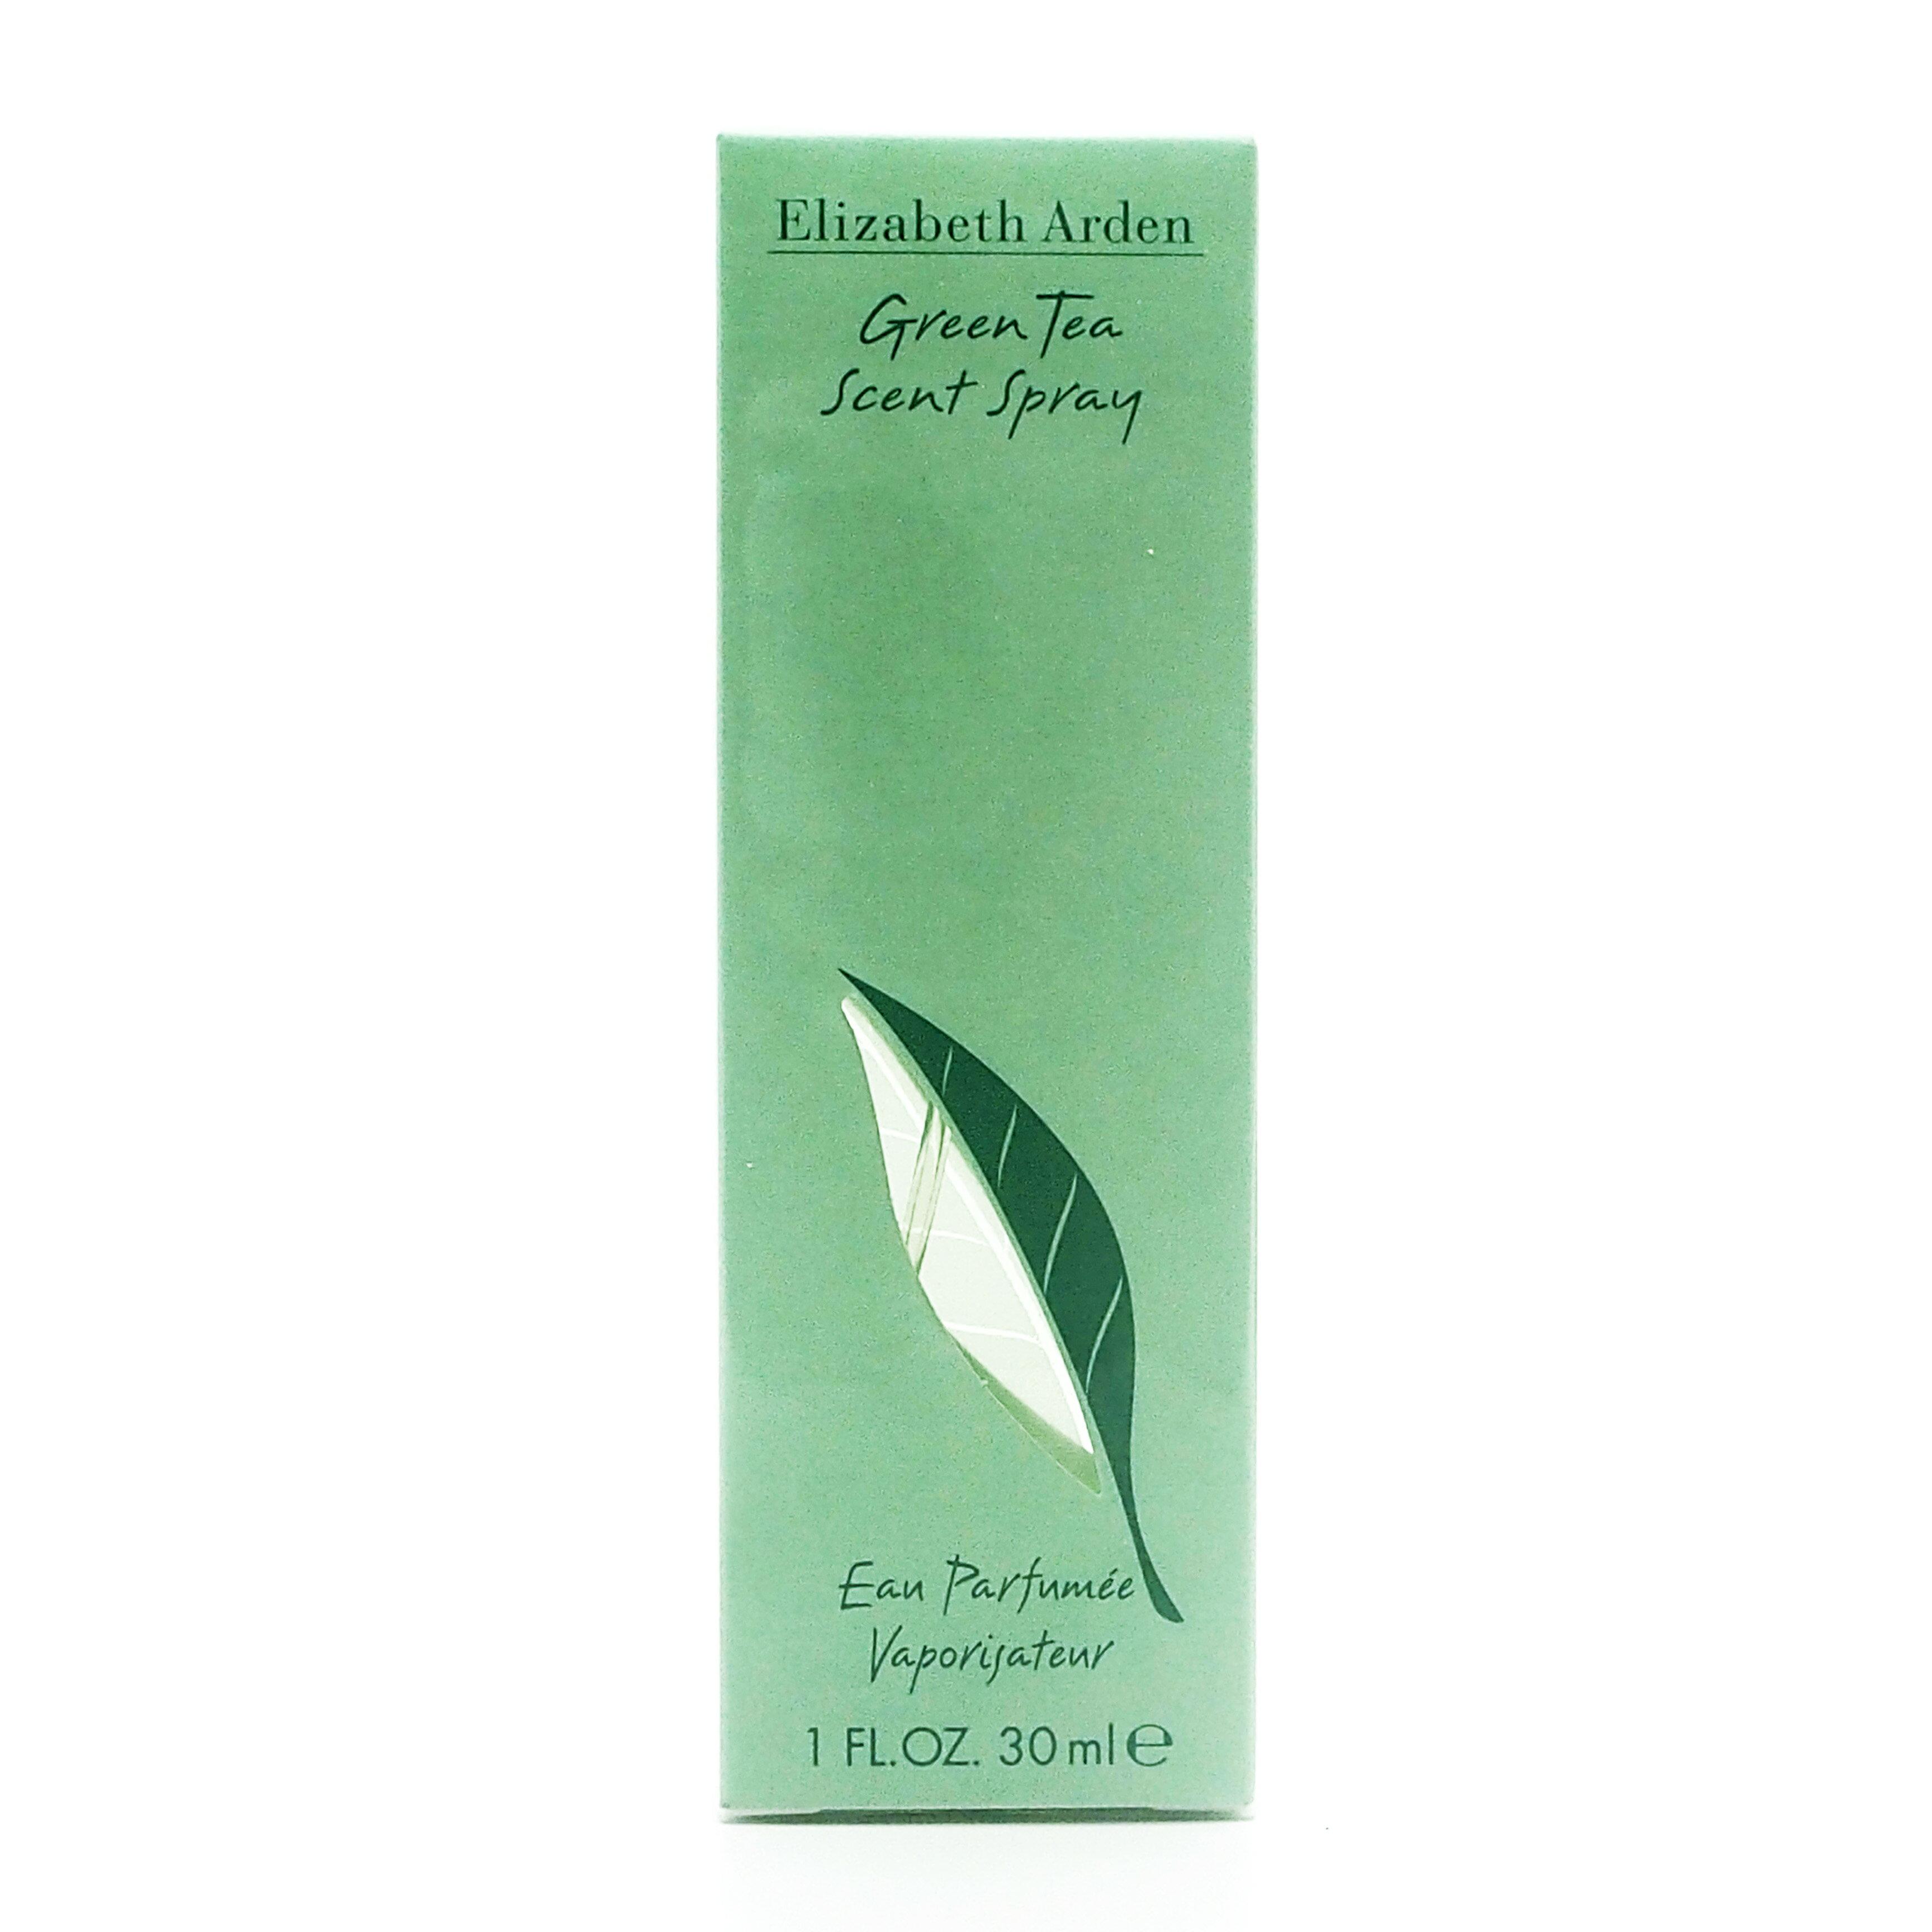 Elizabeth Arden 綠茶噴式香水(30ml)【優.日常】 - 限時優惠好康折扣